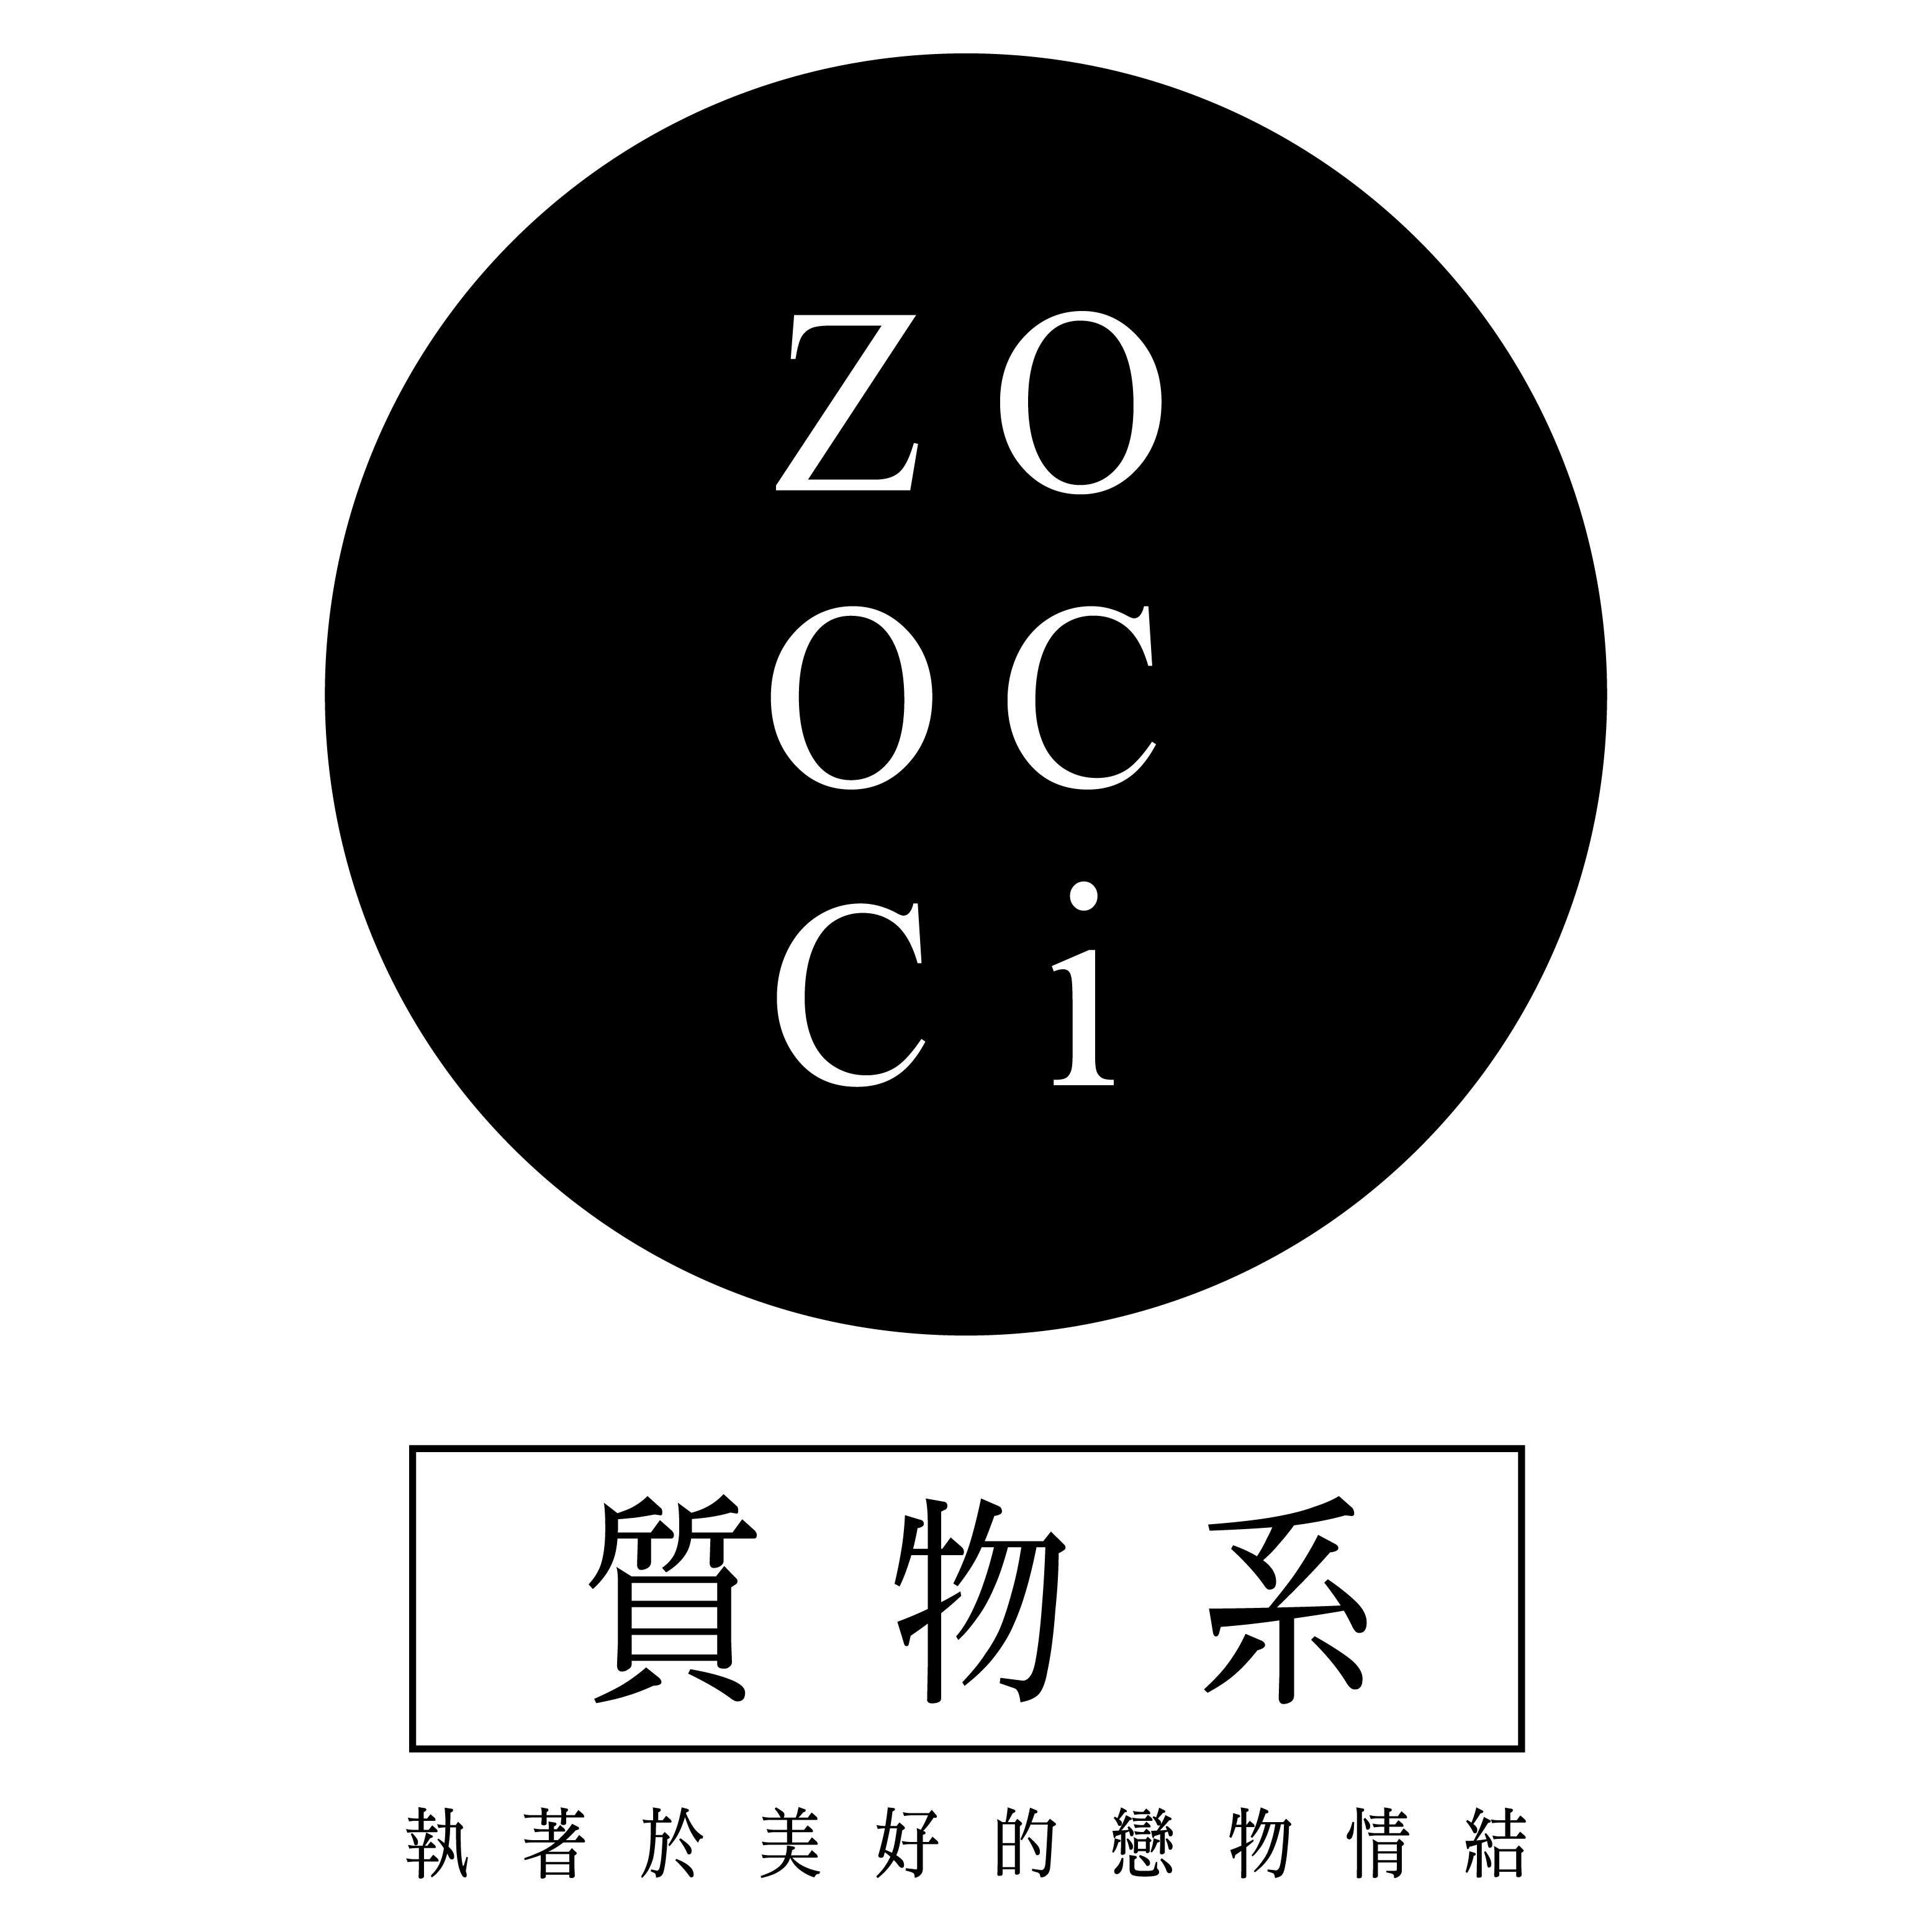 ZOOCCi質物系 Logo